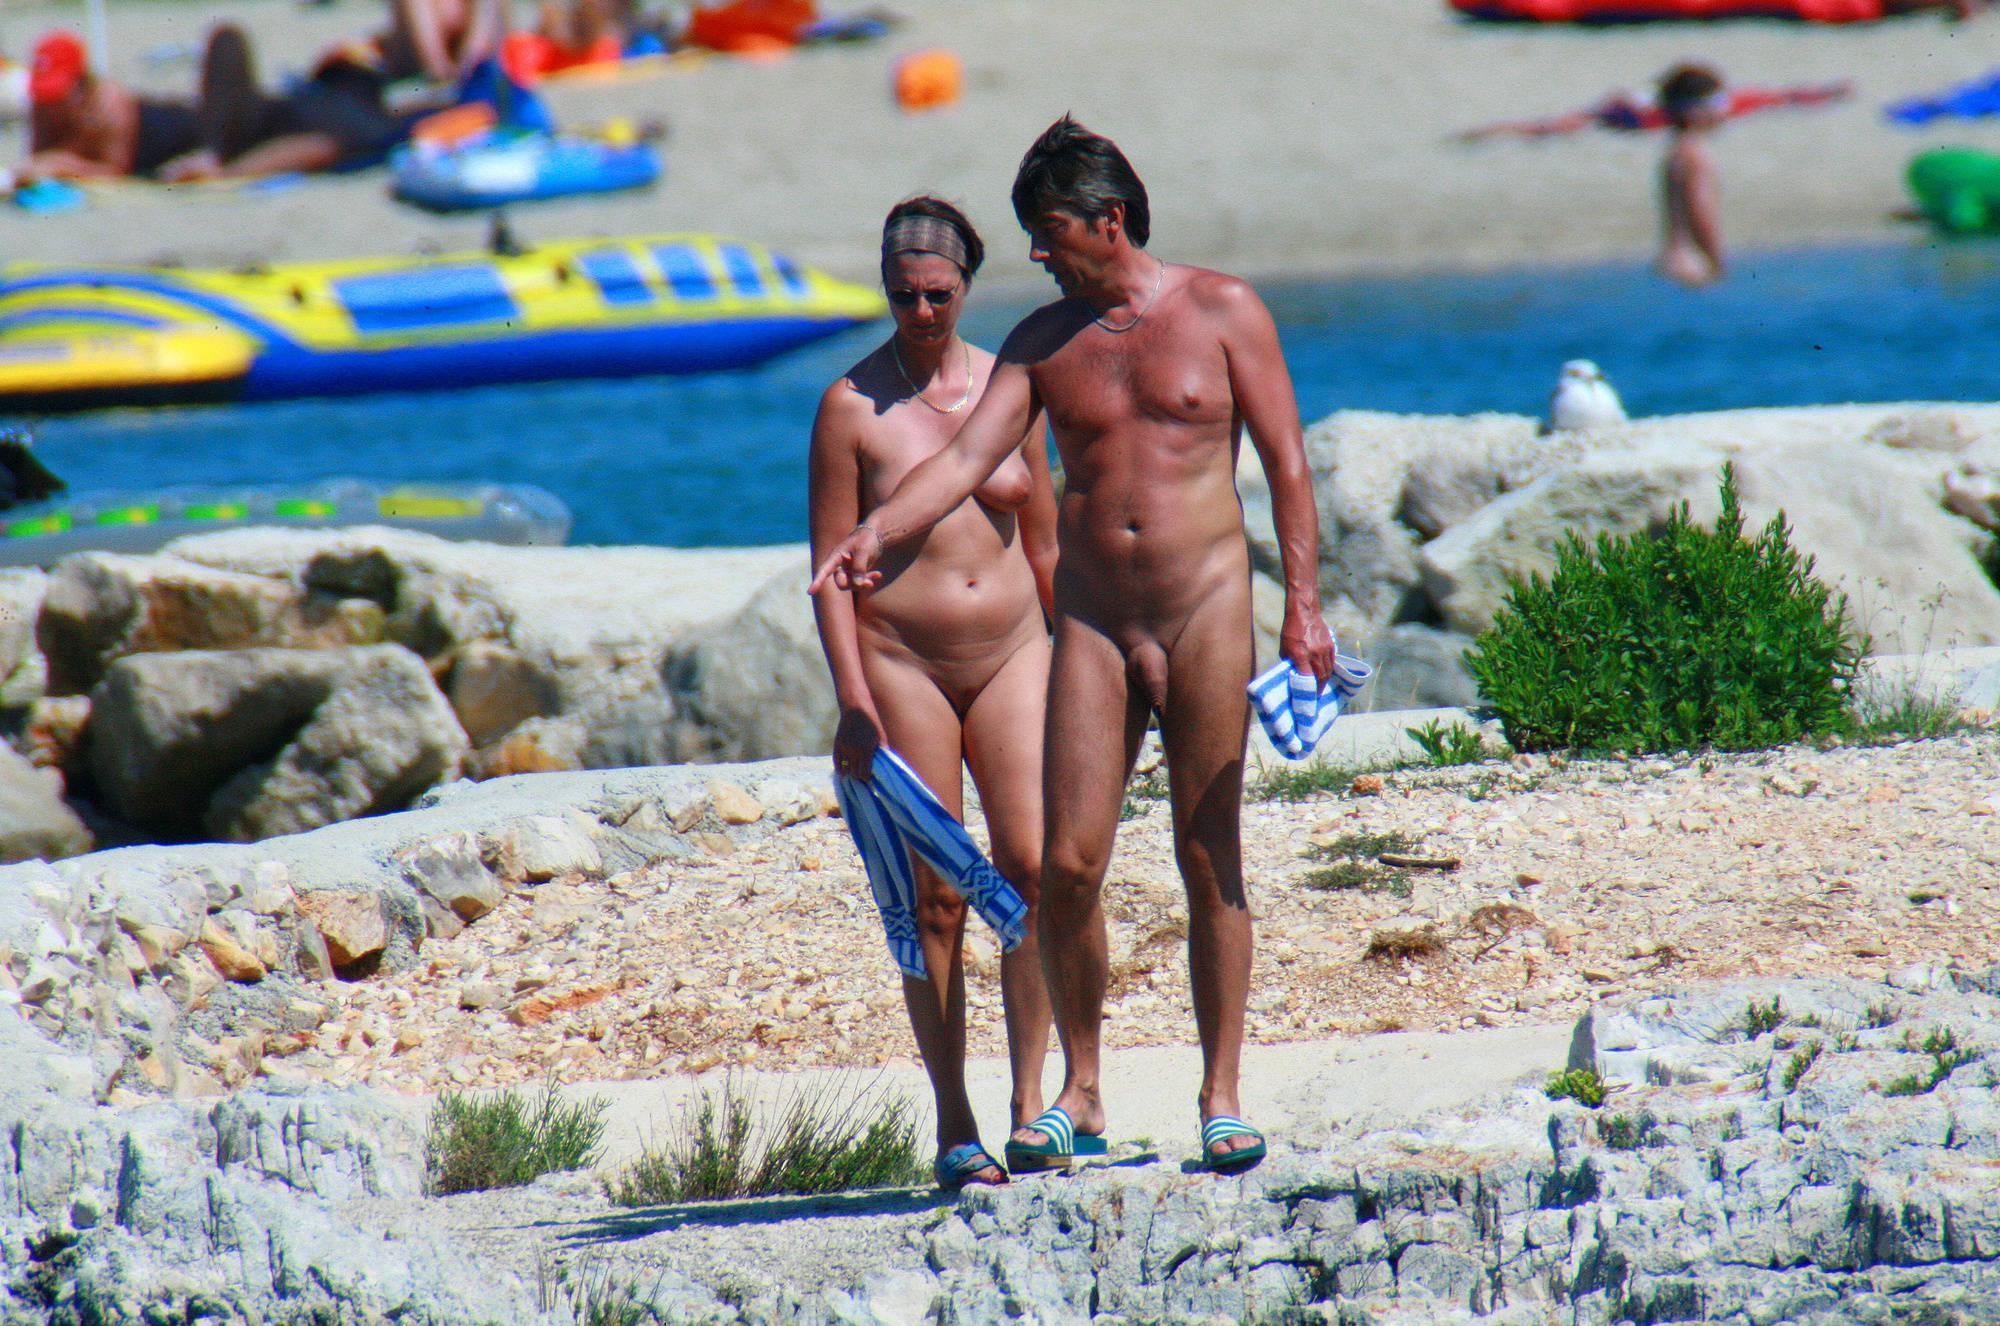 Ula FKK Beach Shorelines - 1